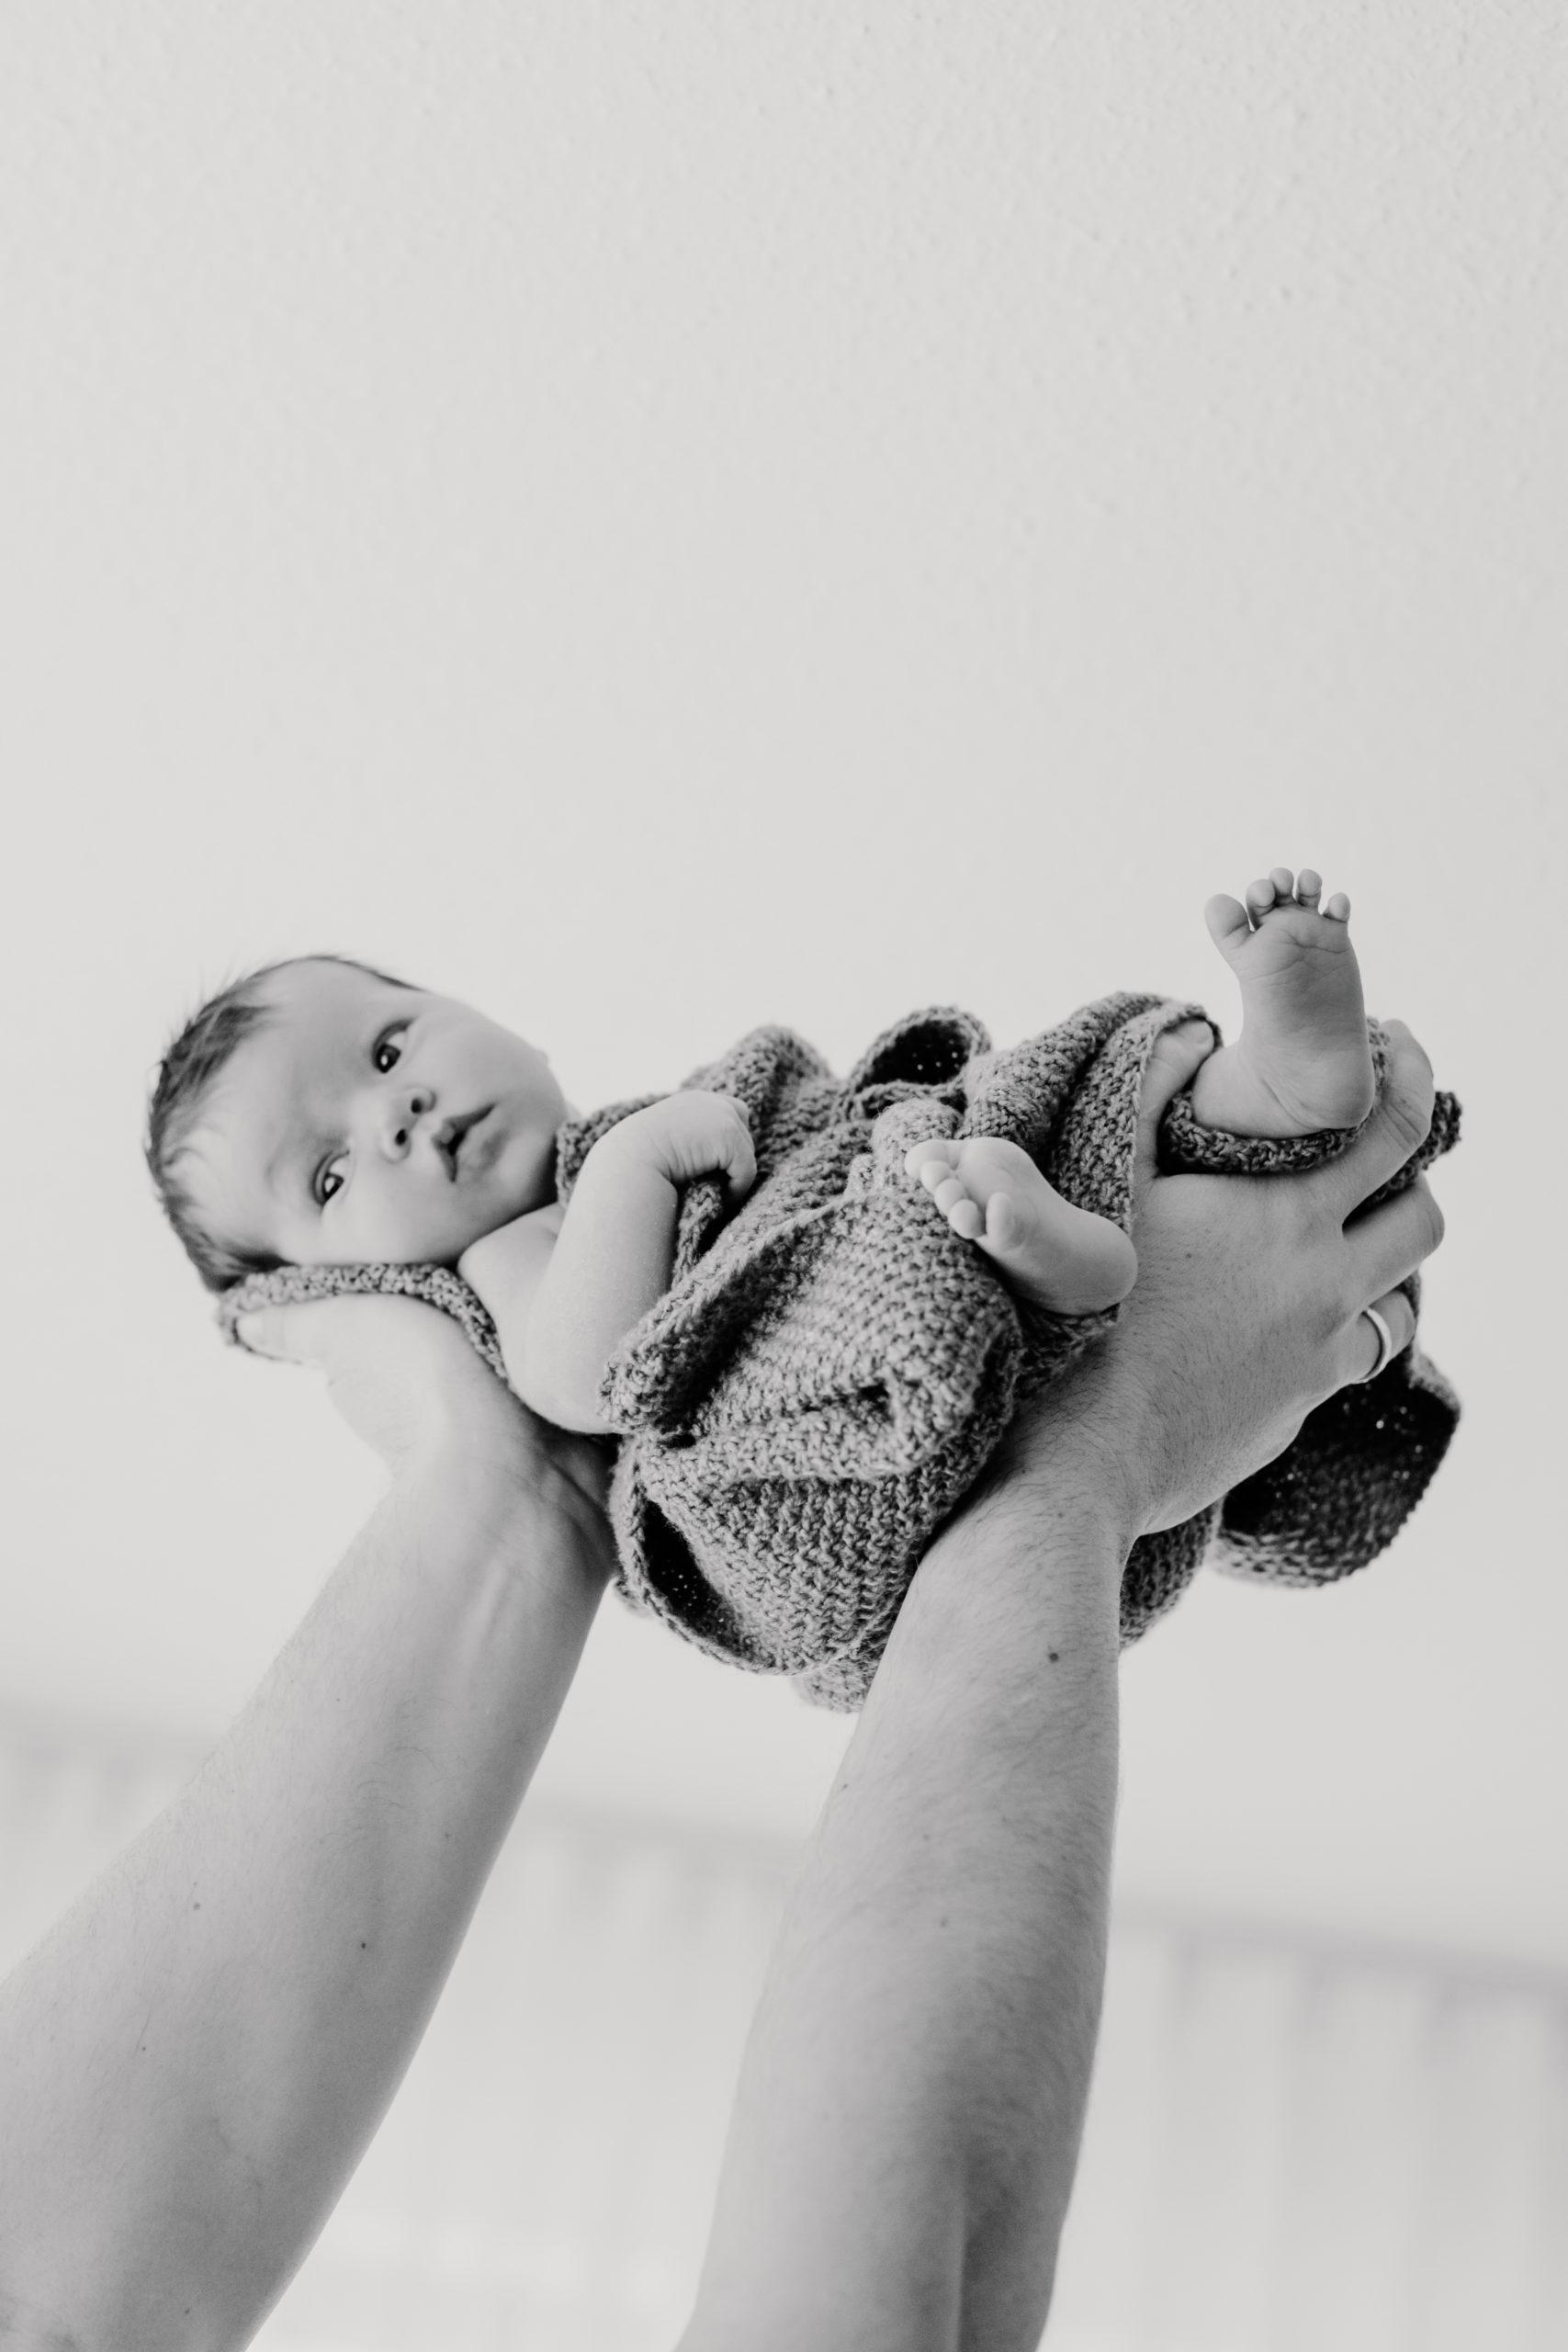 alb, Babyboy, Babyfotograf, Babyfotografie, Babyfotos, Babygirl, baden württemberg, badenwürttemberg, daughter, deutschland, Esslingen, Familienfotos, Fotografin, Fotostory, Homestories, Homestory, metzgen, Mutter, newborn, newborn Fotos, newbornfotografie, Nürtingen, pregnant, Reutlingen, schwäbische alb, schwanger, Schwangerschaft, Schwangerschaftsbilder, Schwangerschaftsfotografie, Schwangerschaftsfotos, Sohn, Stuttgart, Tochter, Tübingen, Vater, Zuhause